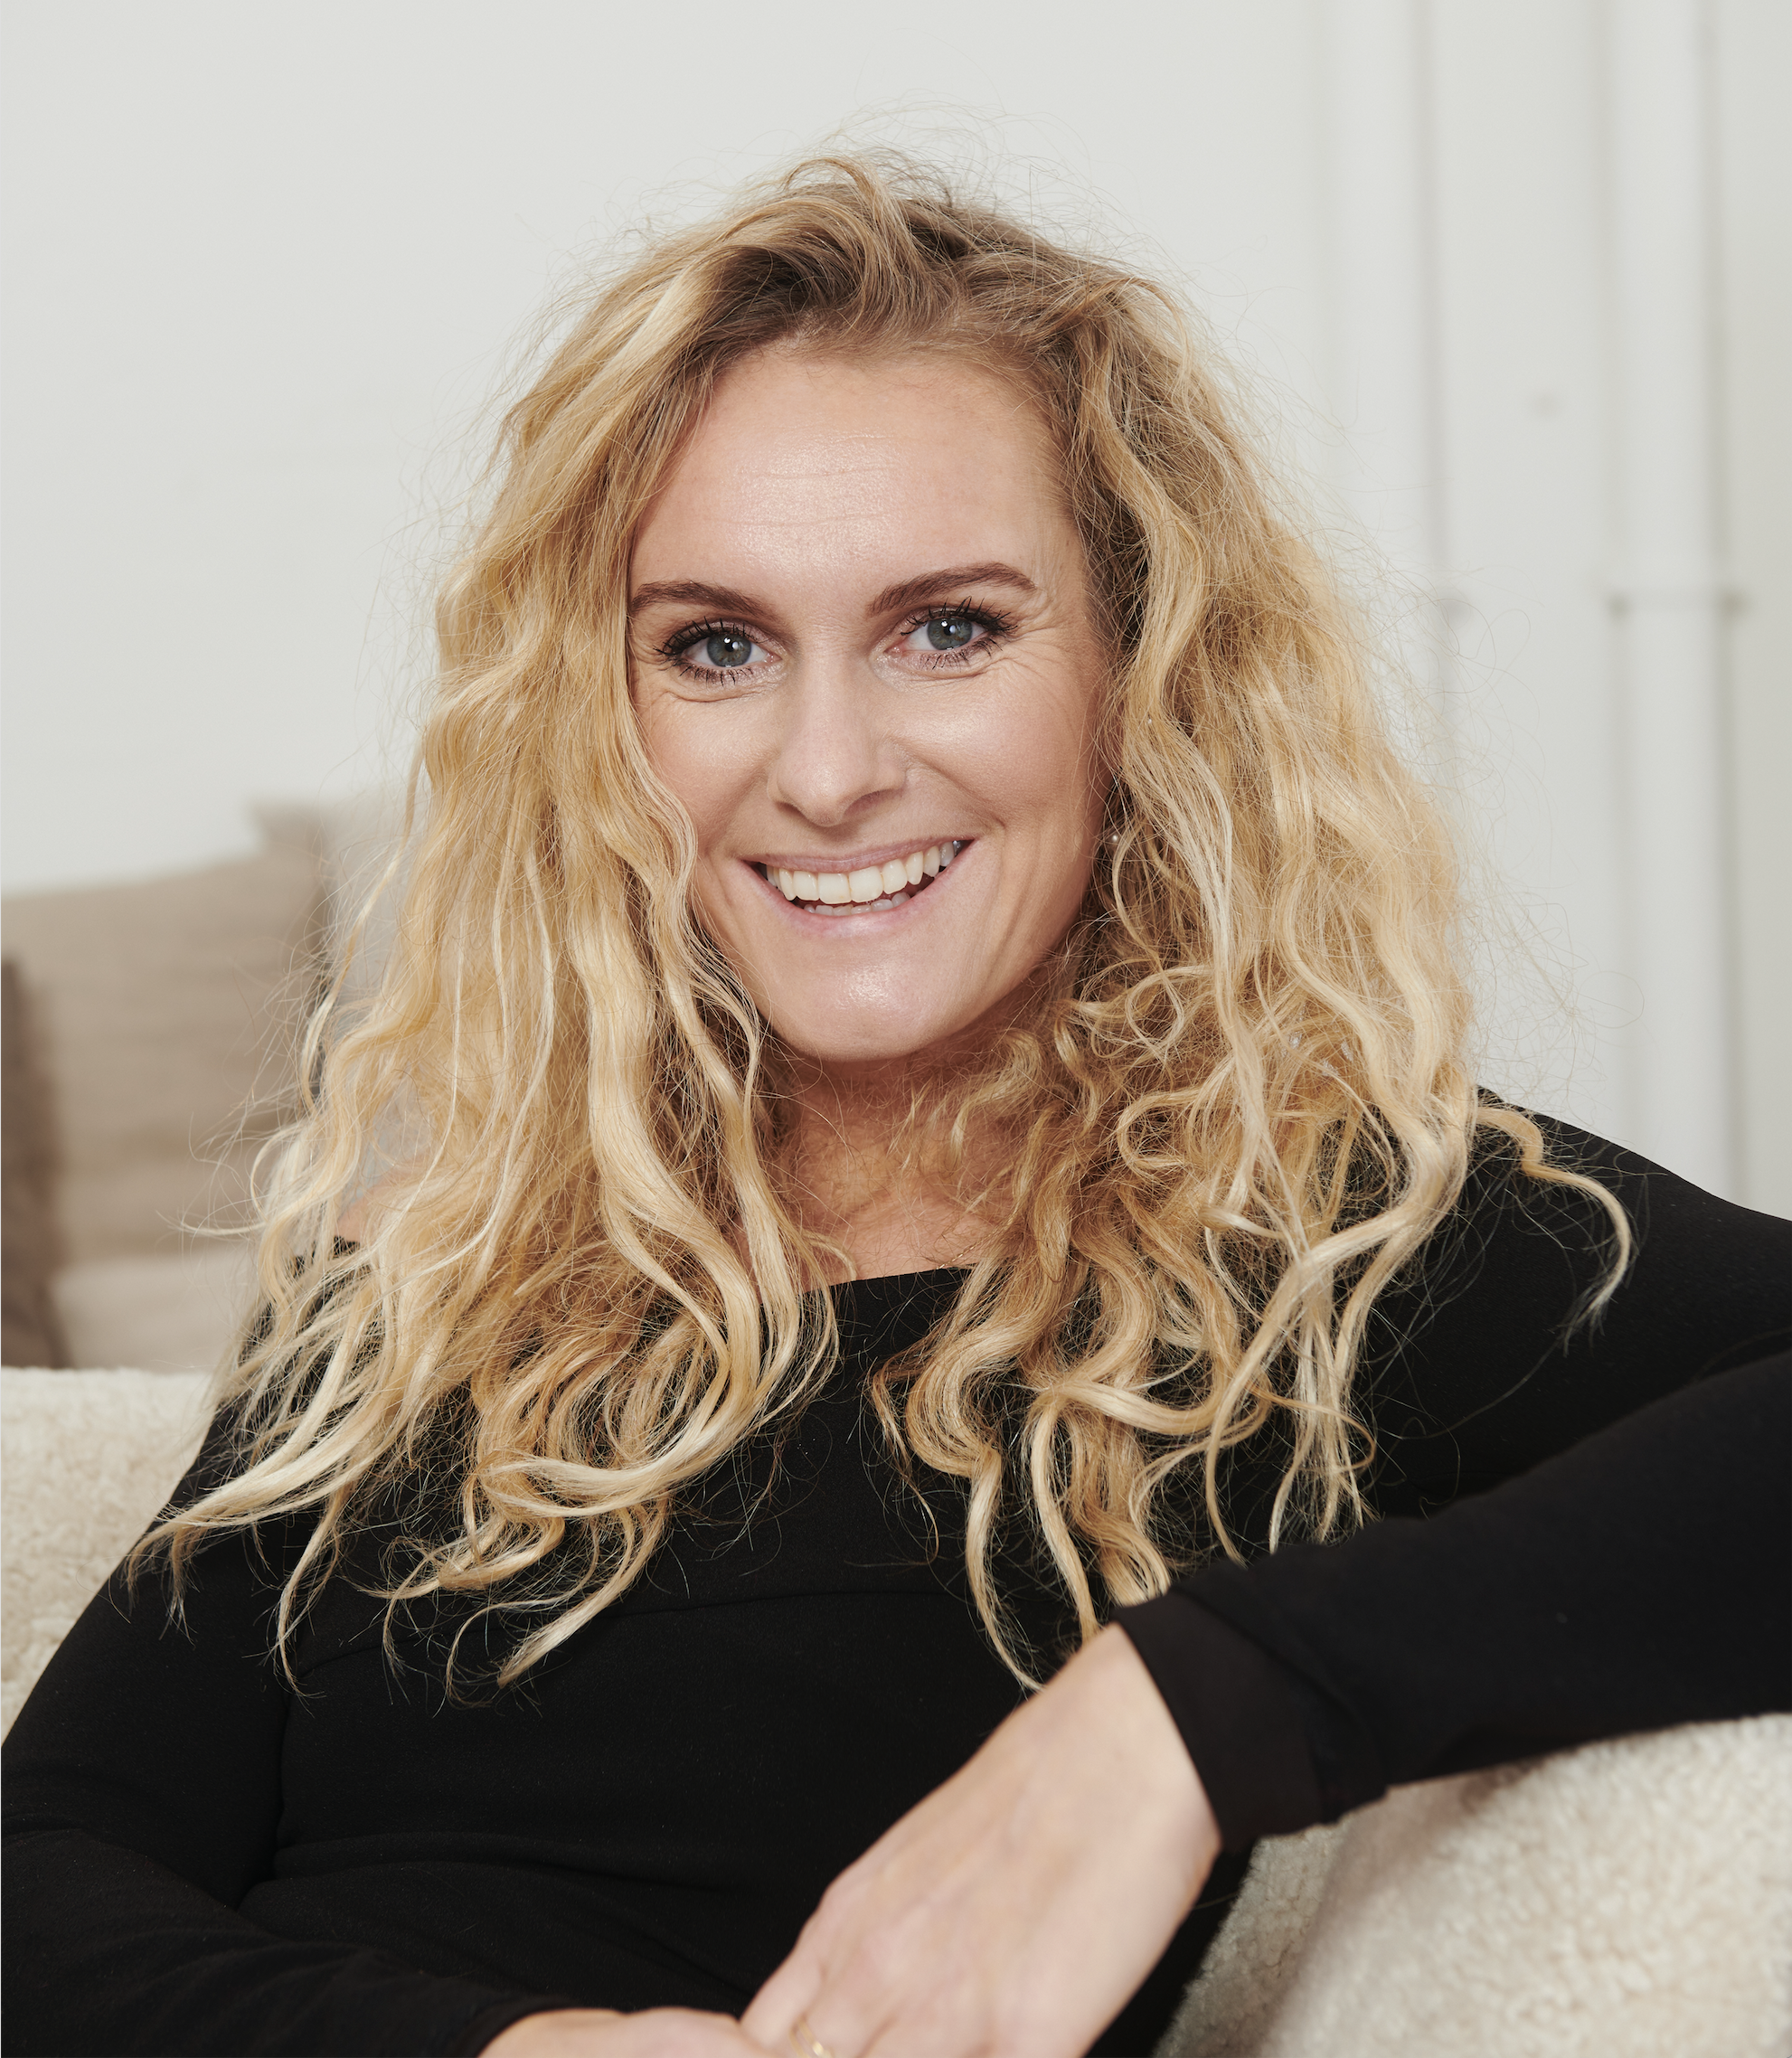 Maria Westergaard